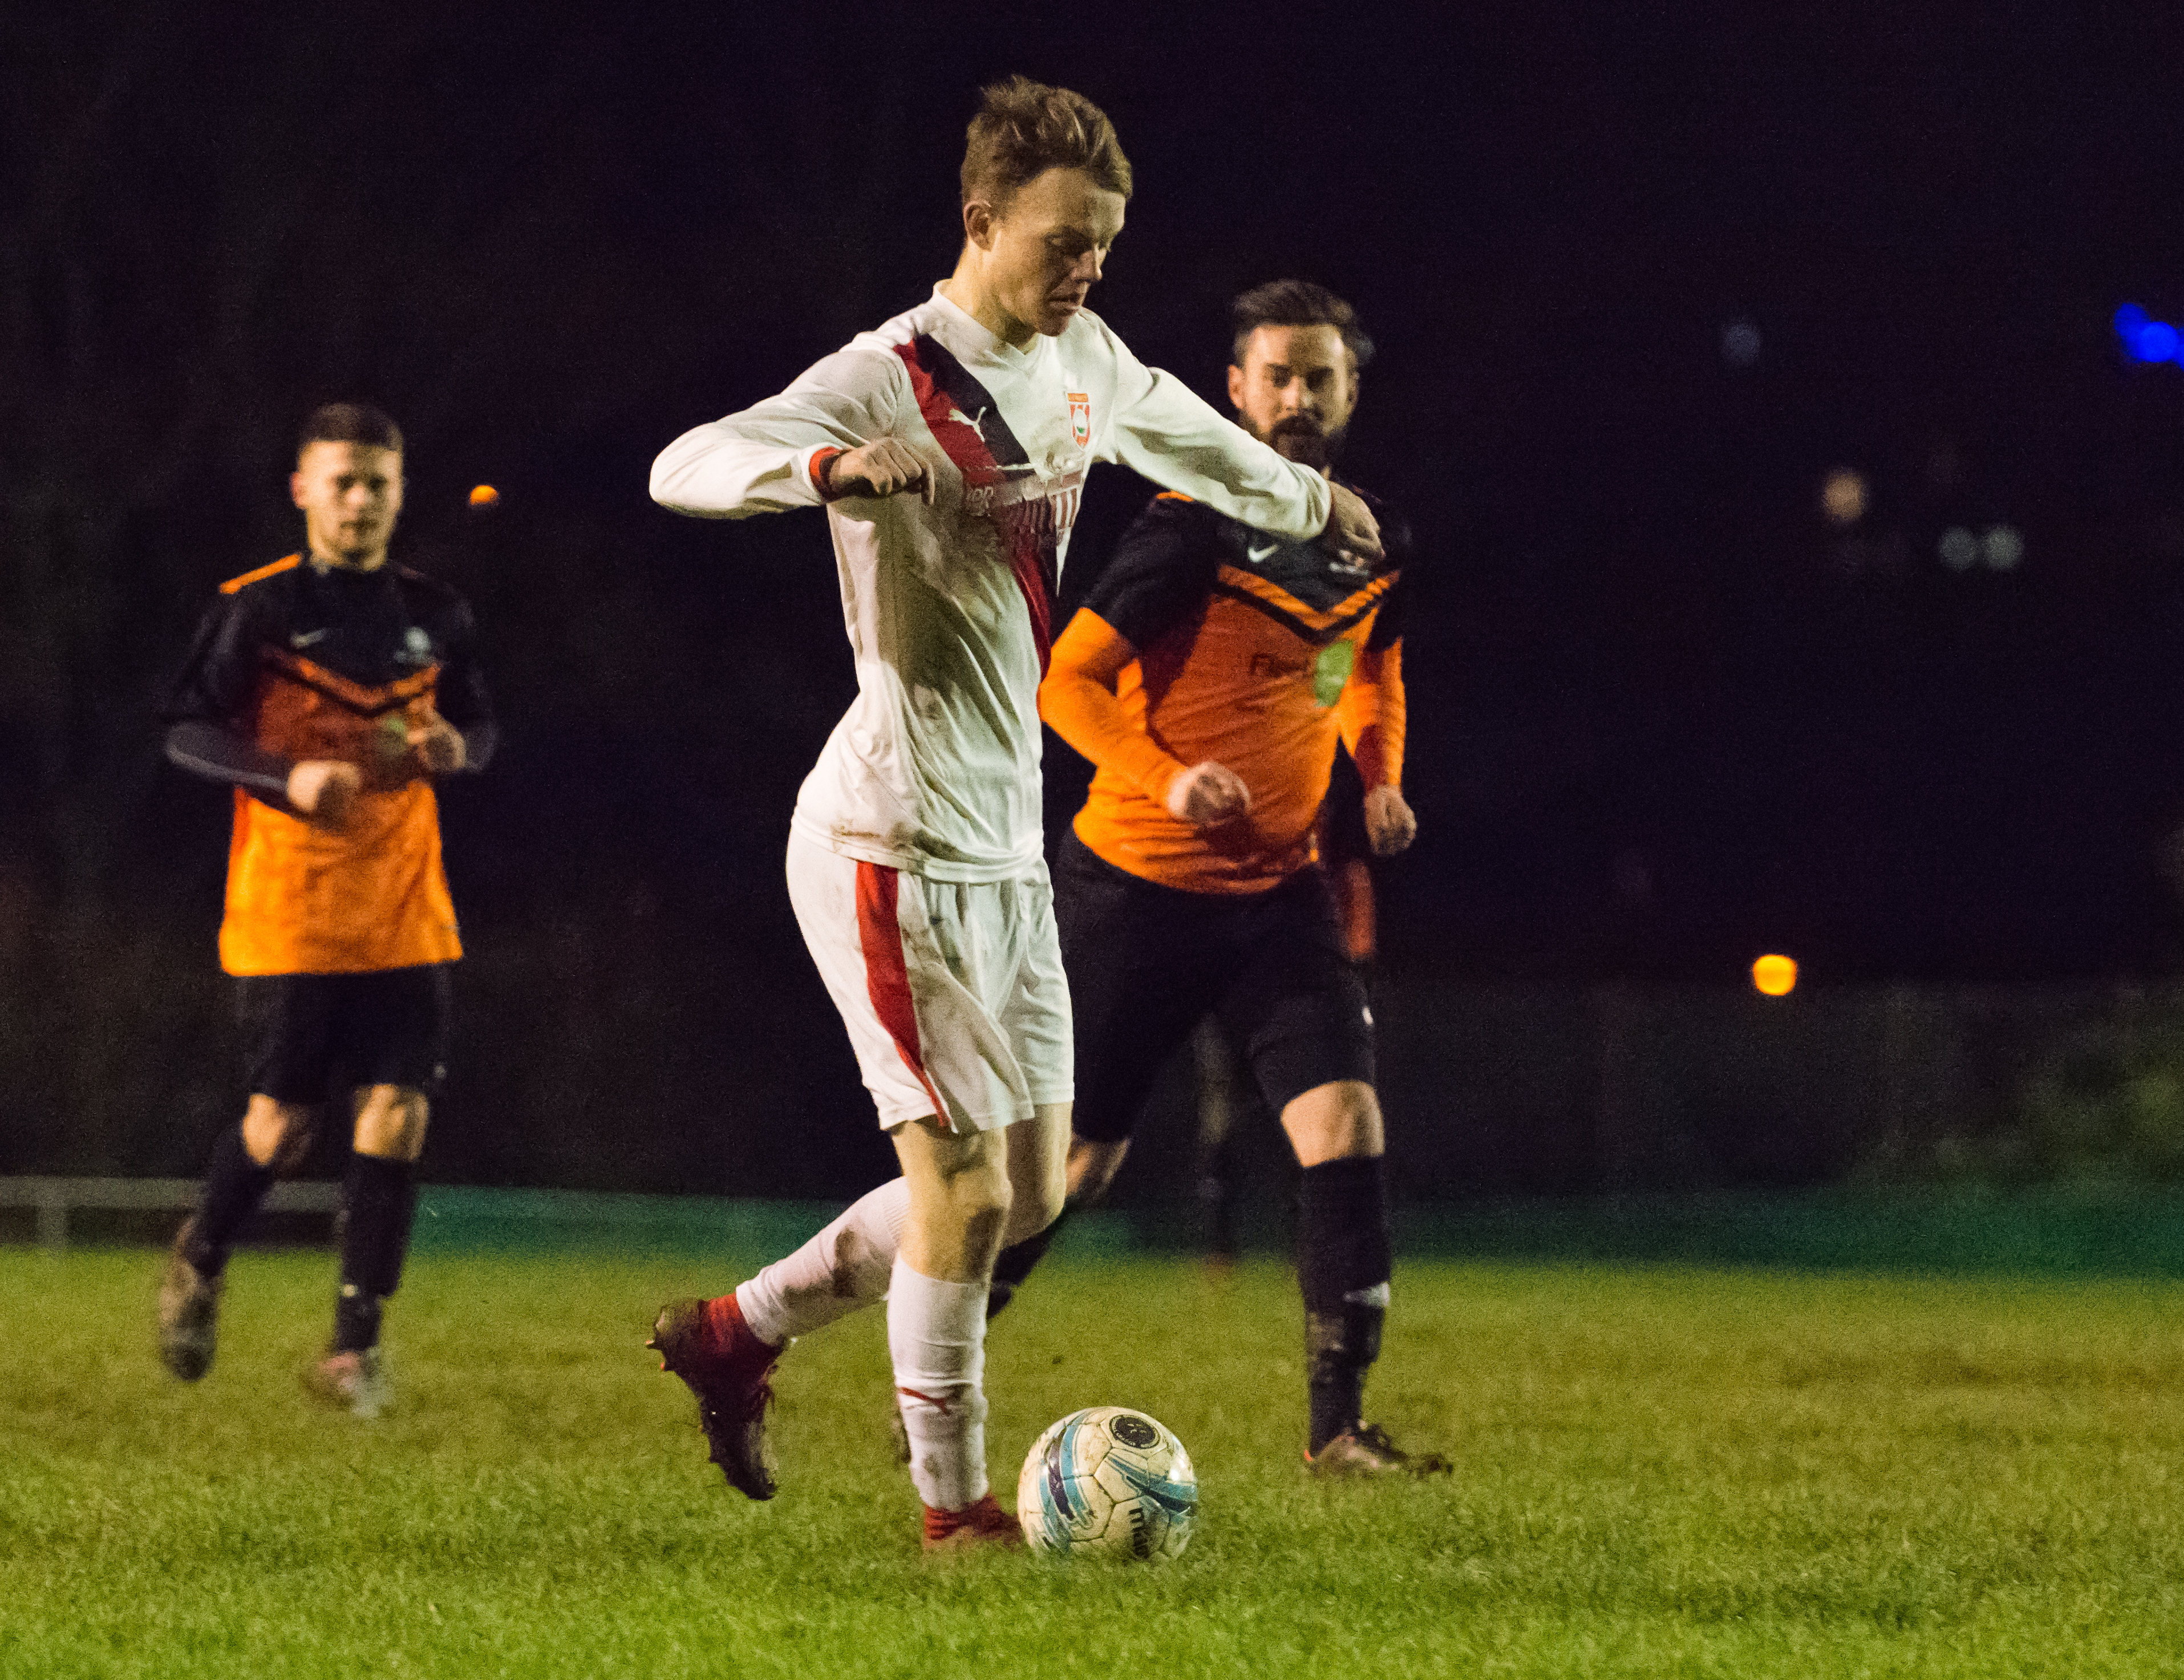 Mile Oak U21s vs Southwick FC U21s 14.12.17 17